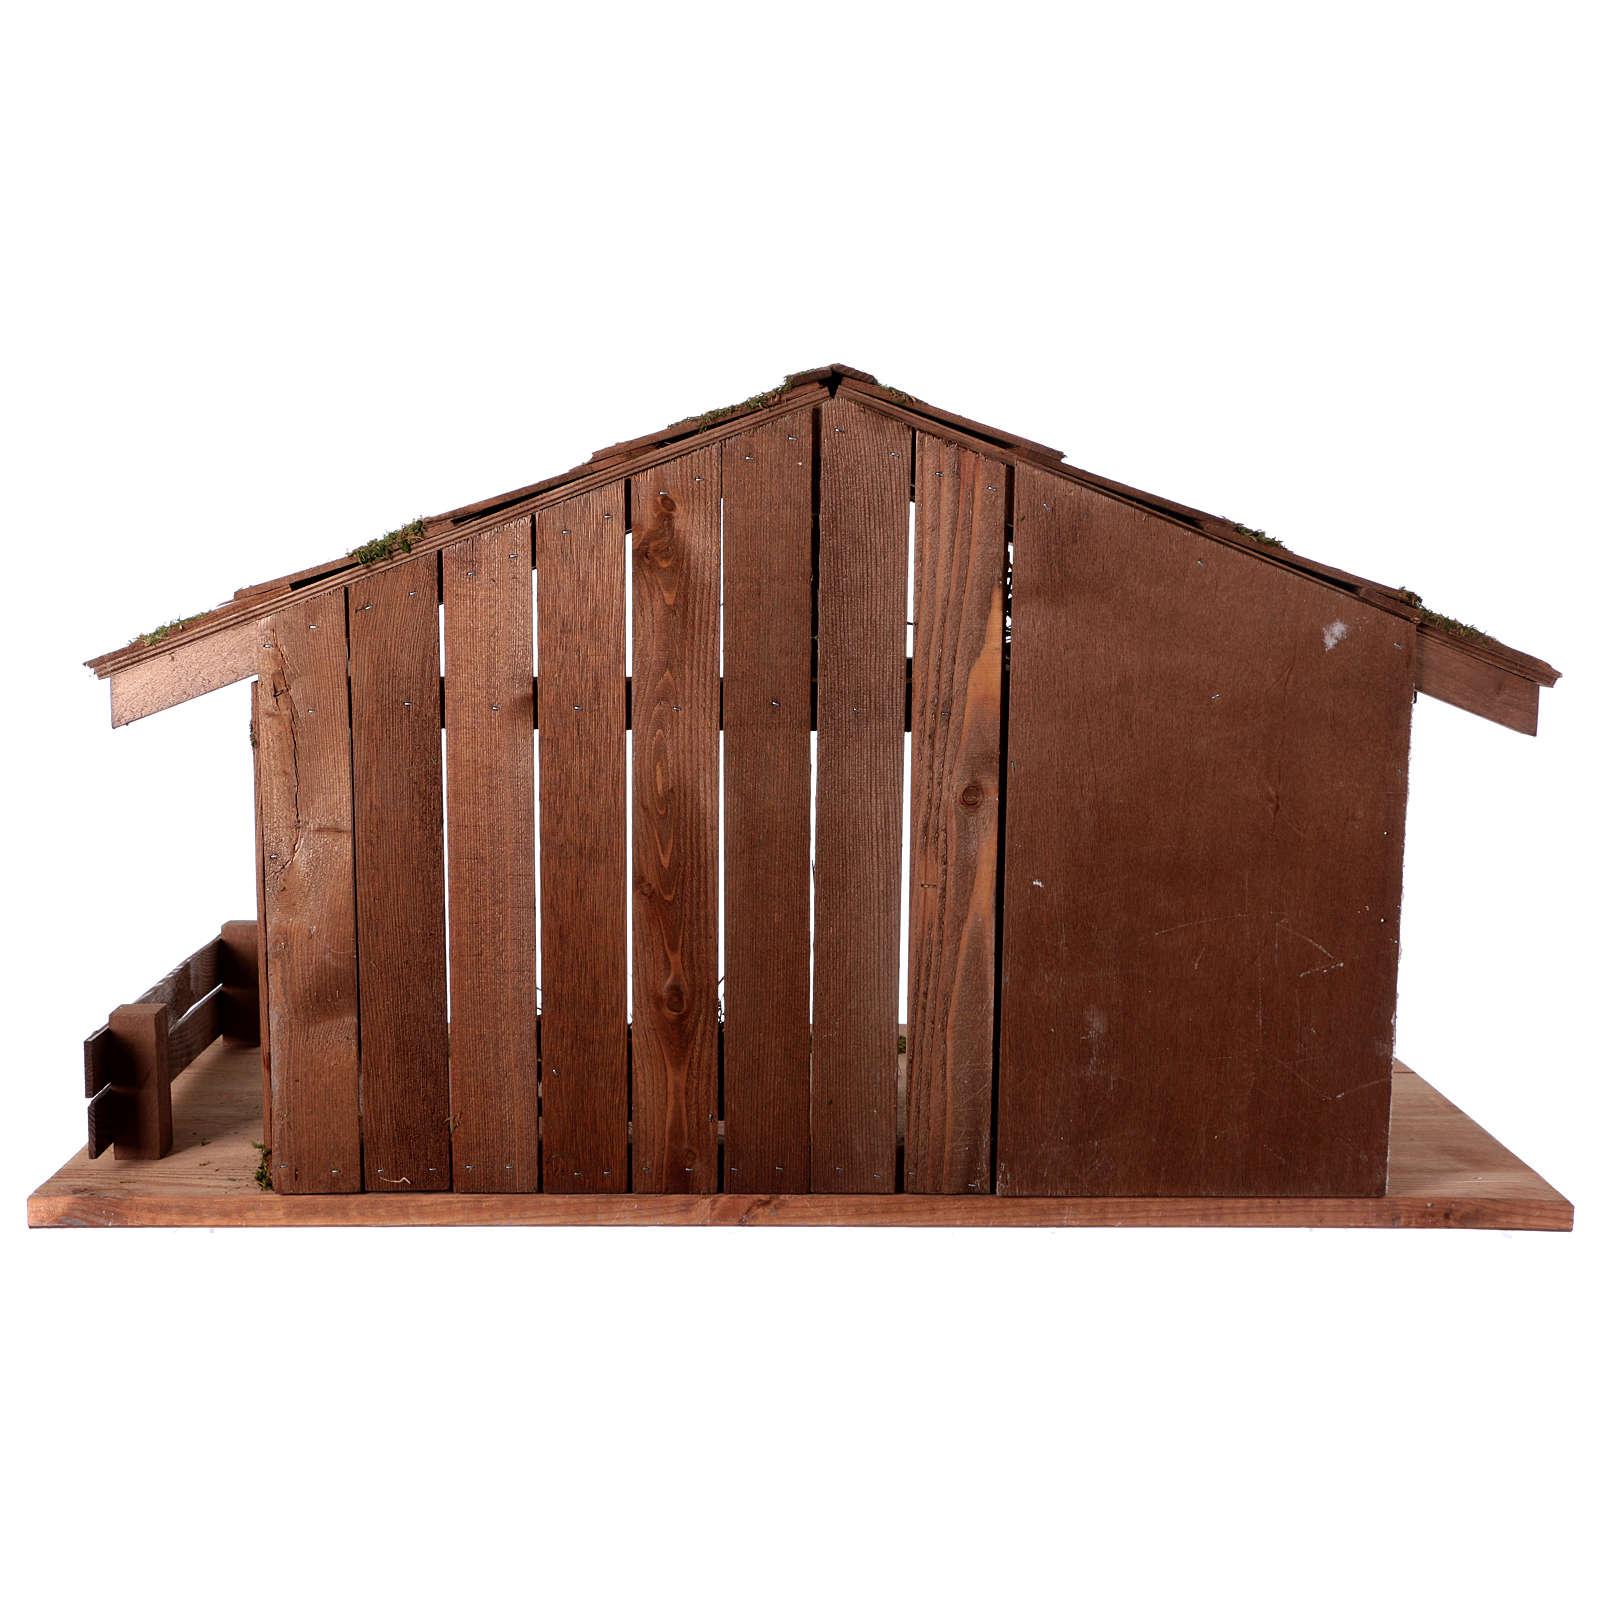 Capanna stile nordico mangiatoia stalla 43x80x40 presepi 20 cm 4